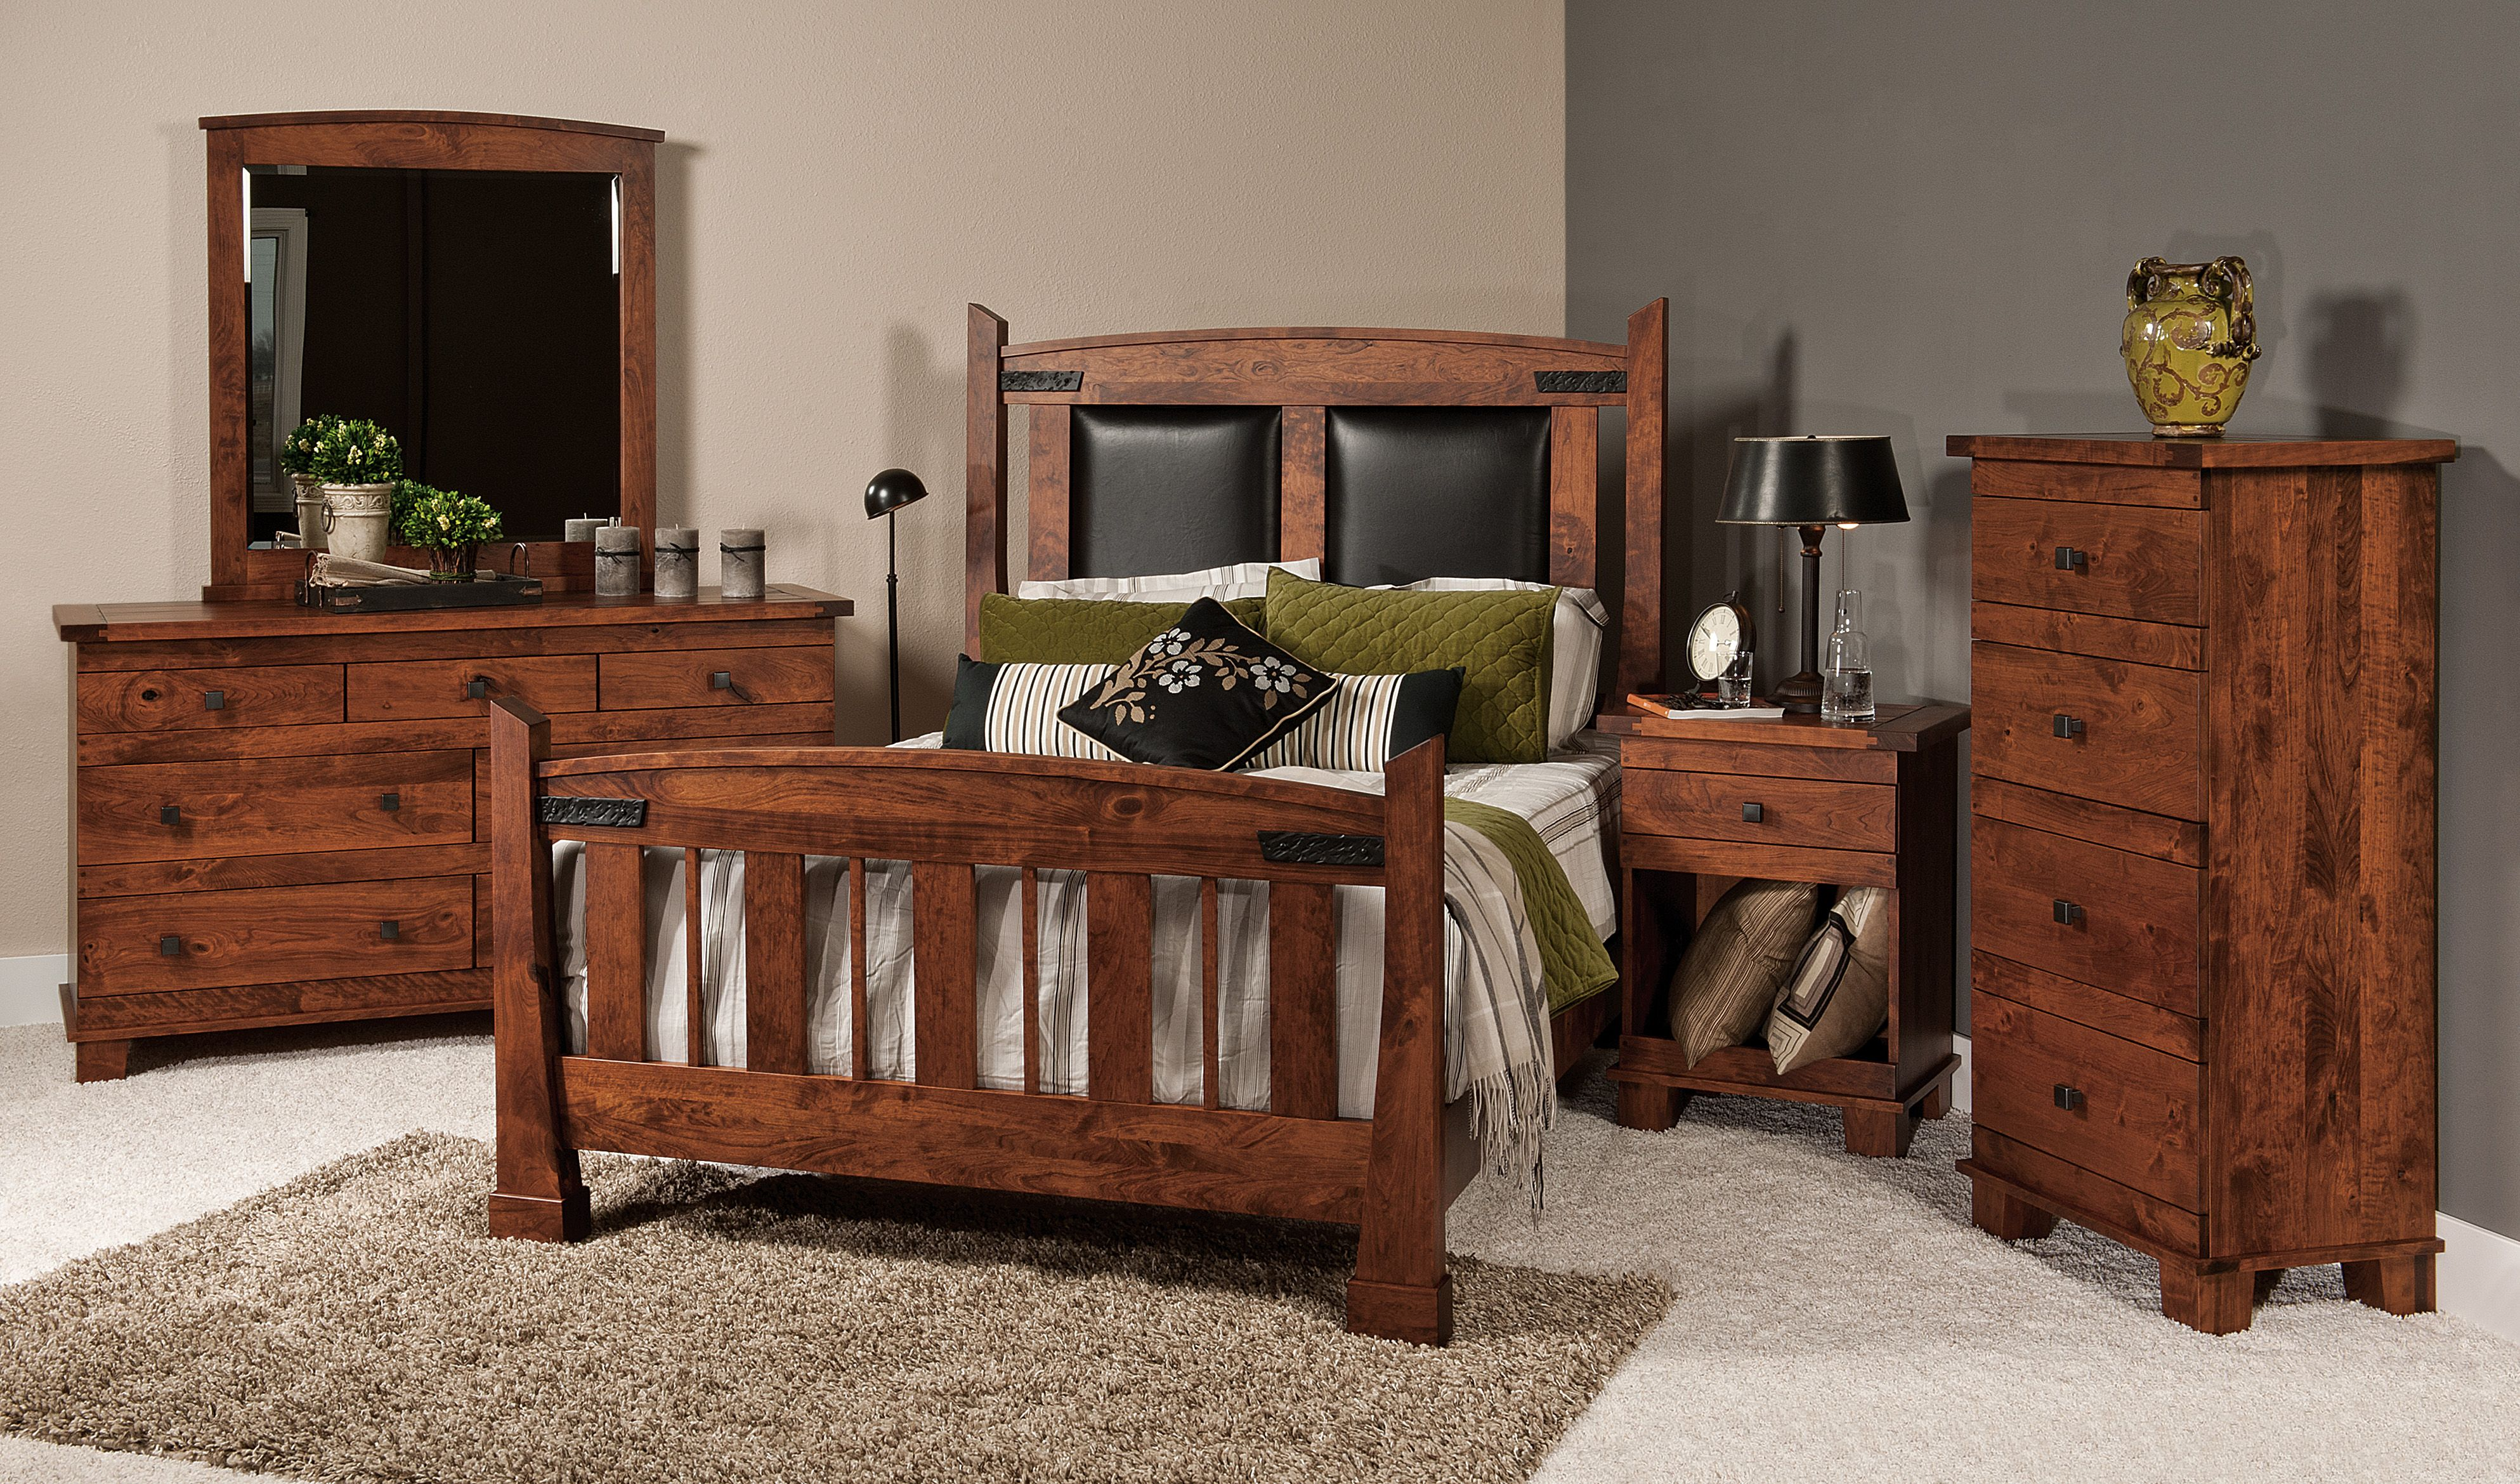 Larado collection bedroom furniture pinterest amish crafts